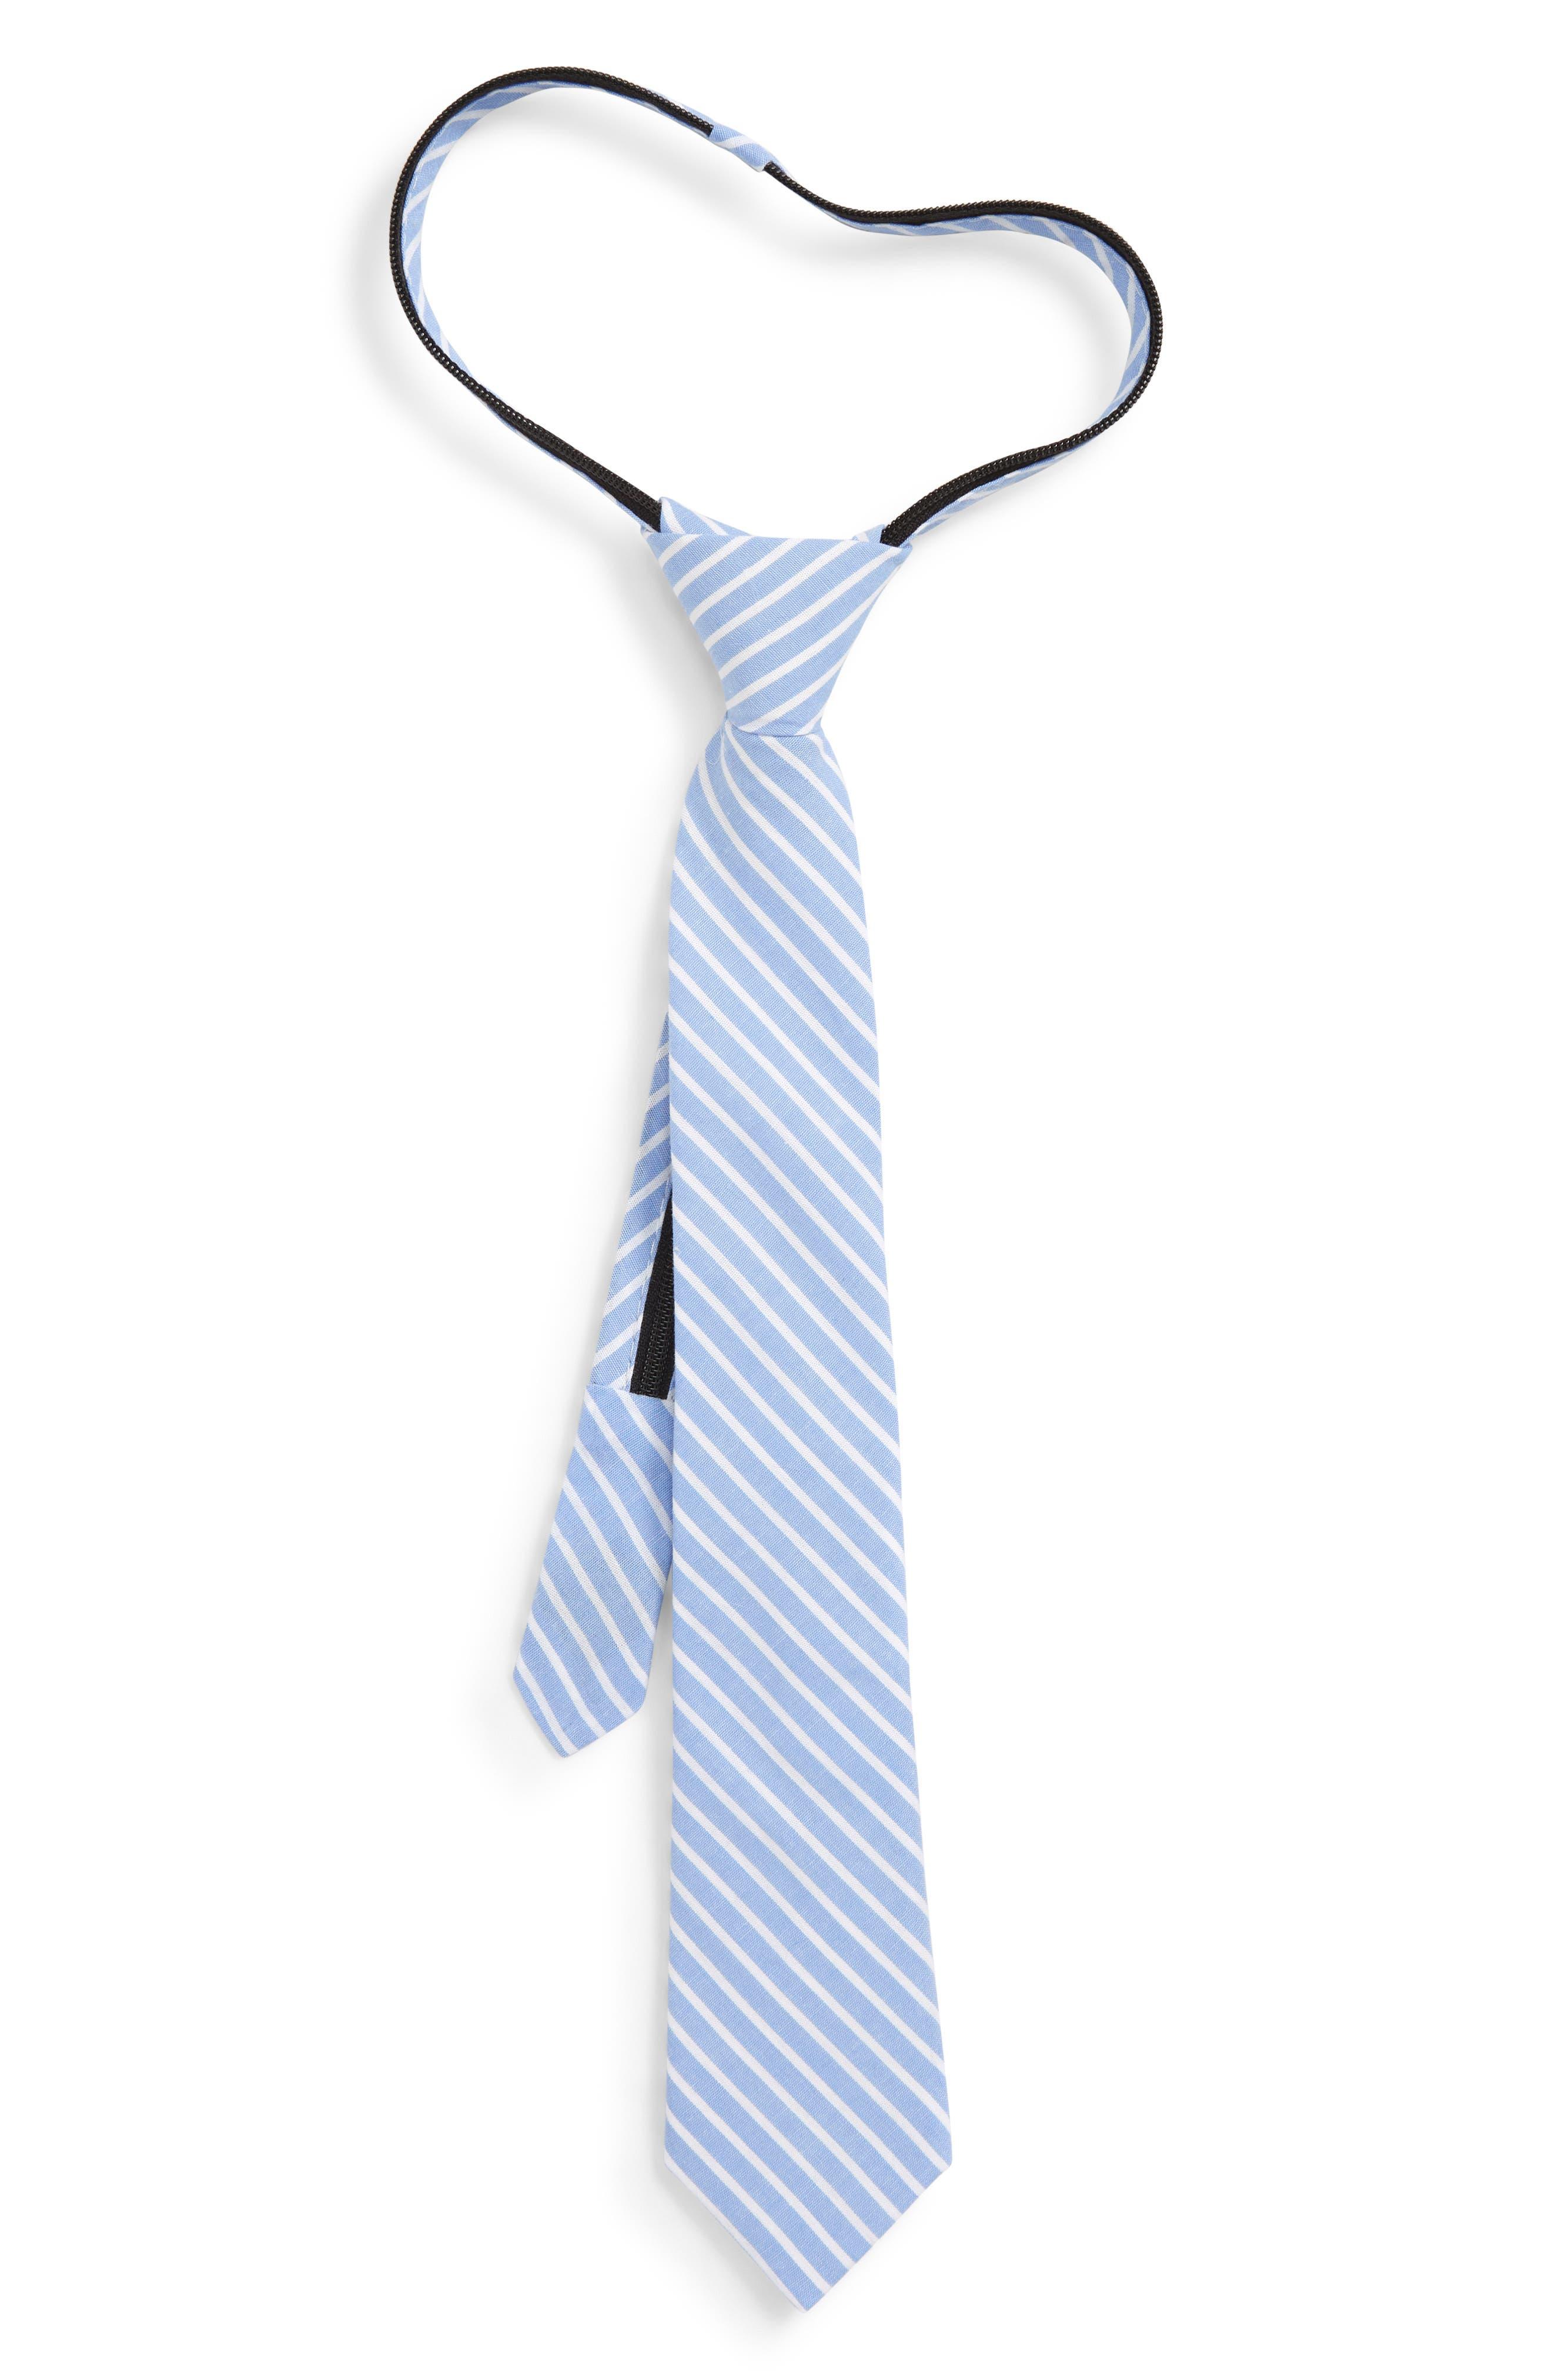 NORDSTROM Jacob Solid Cotton Zipper Tie, Main, color, 400